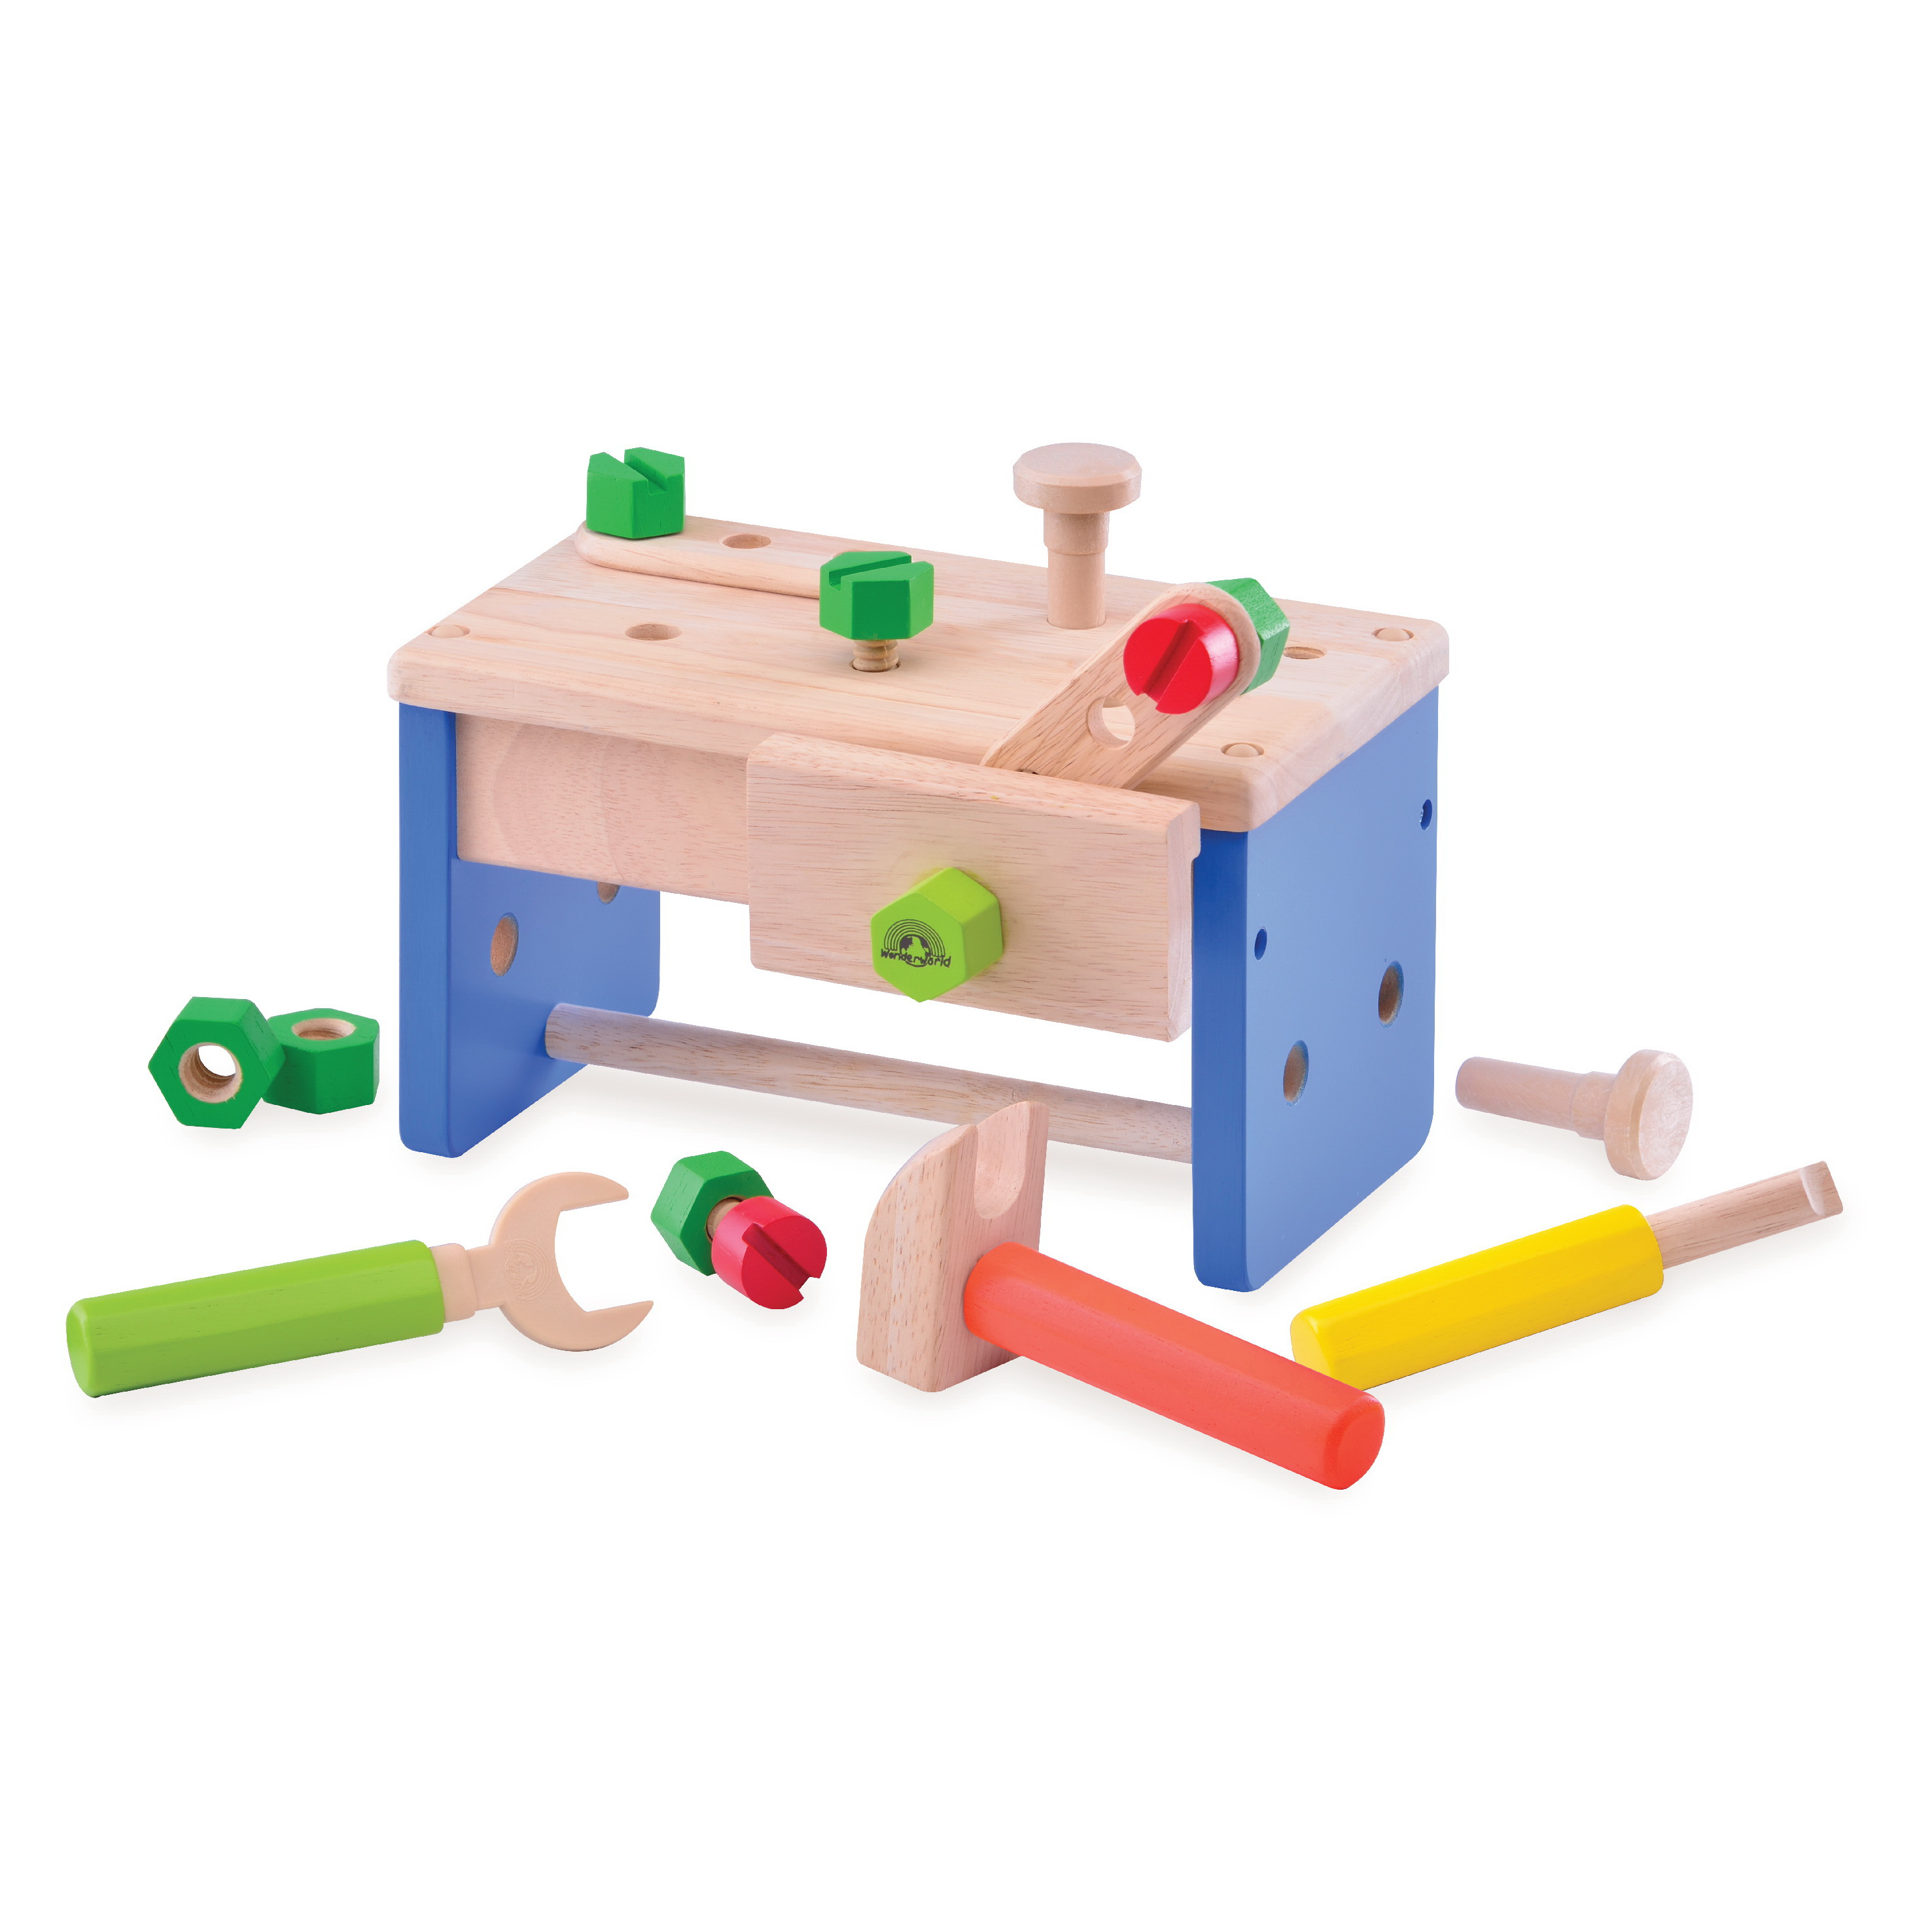 Ww 4519 Work Bench N Box Wonderworldtoy Natural Toys